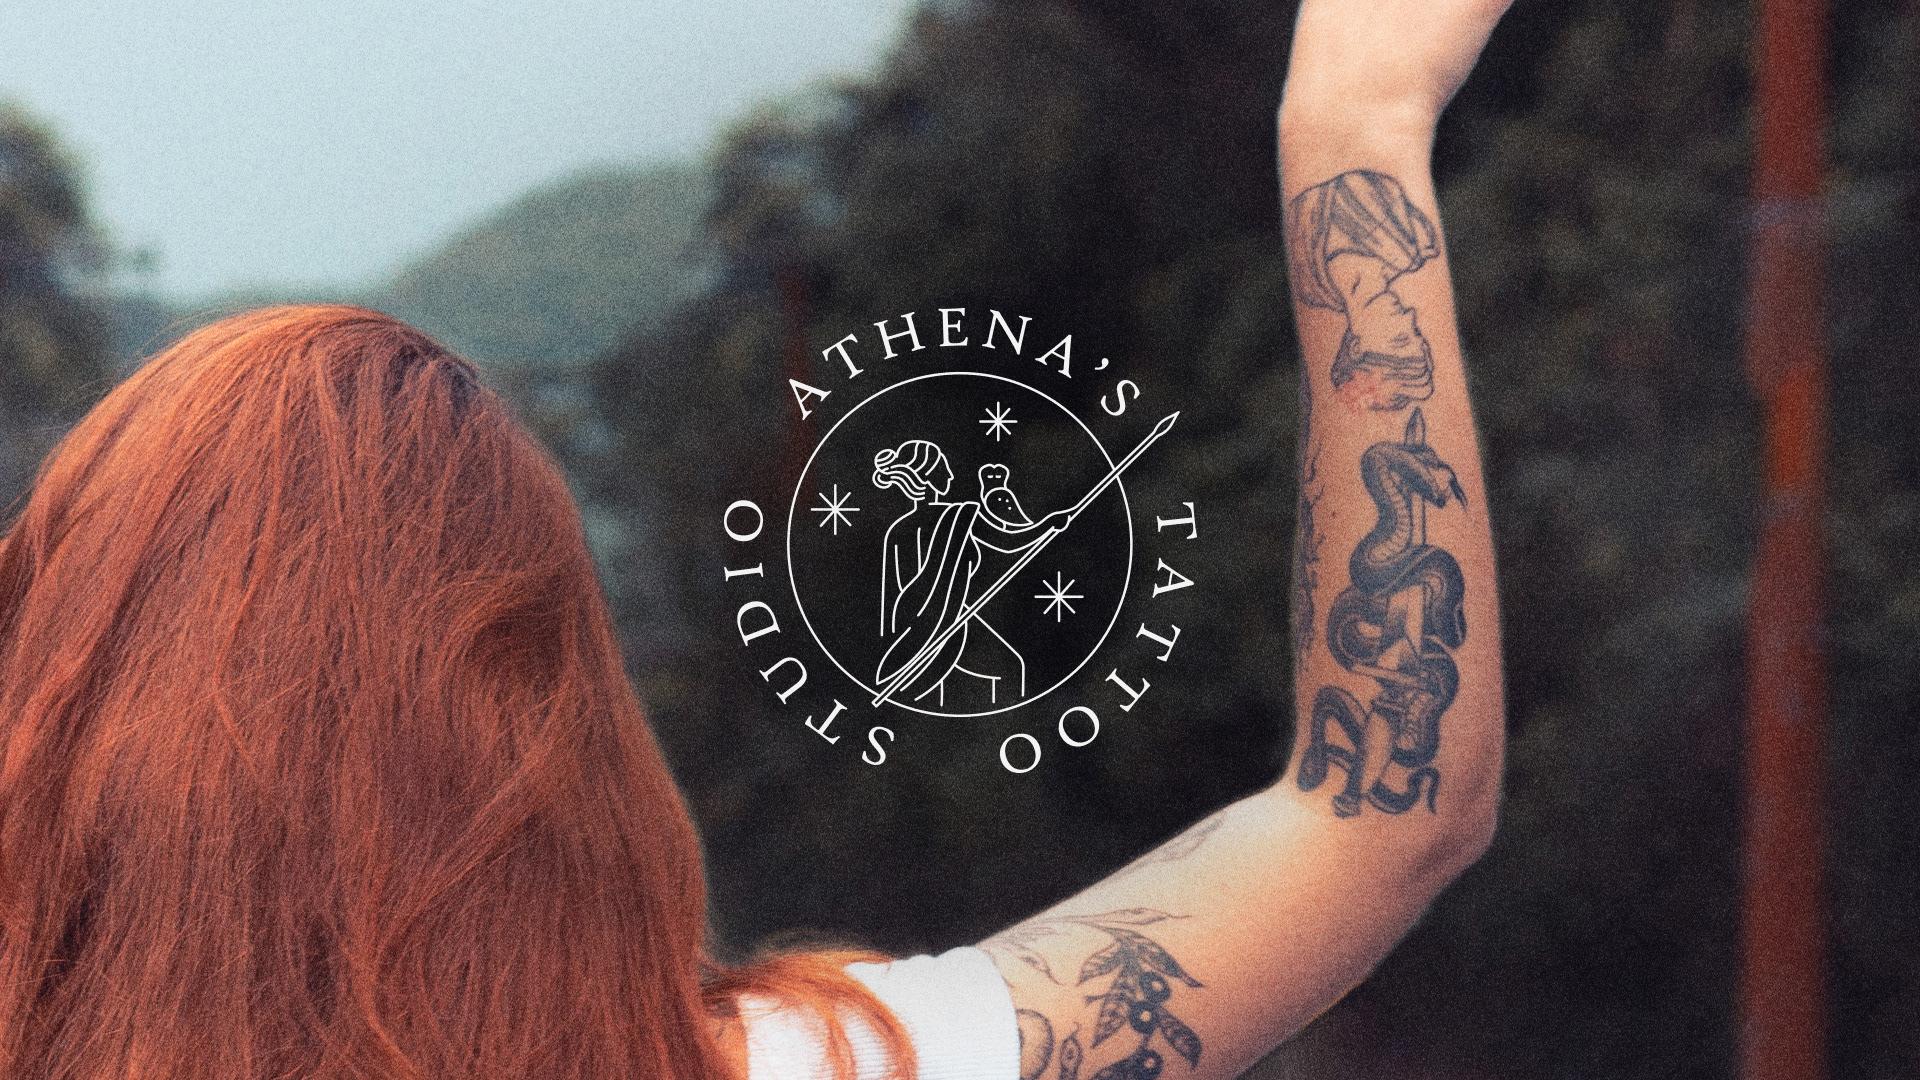 Tattoo Studio Design Projects Photos Videos Logos Illustrations And Branding On Behance